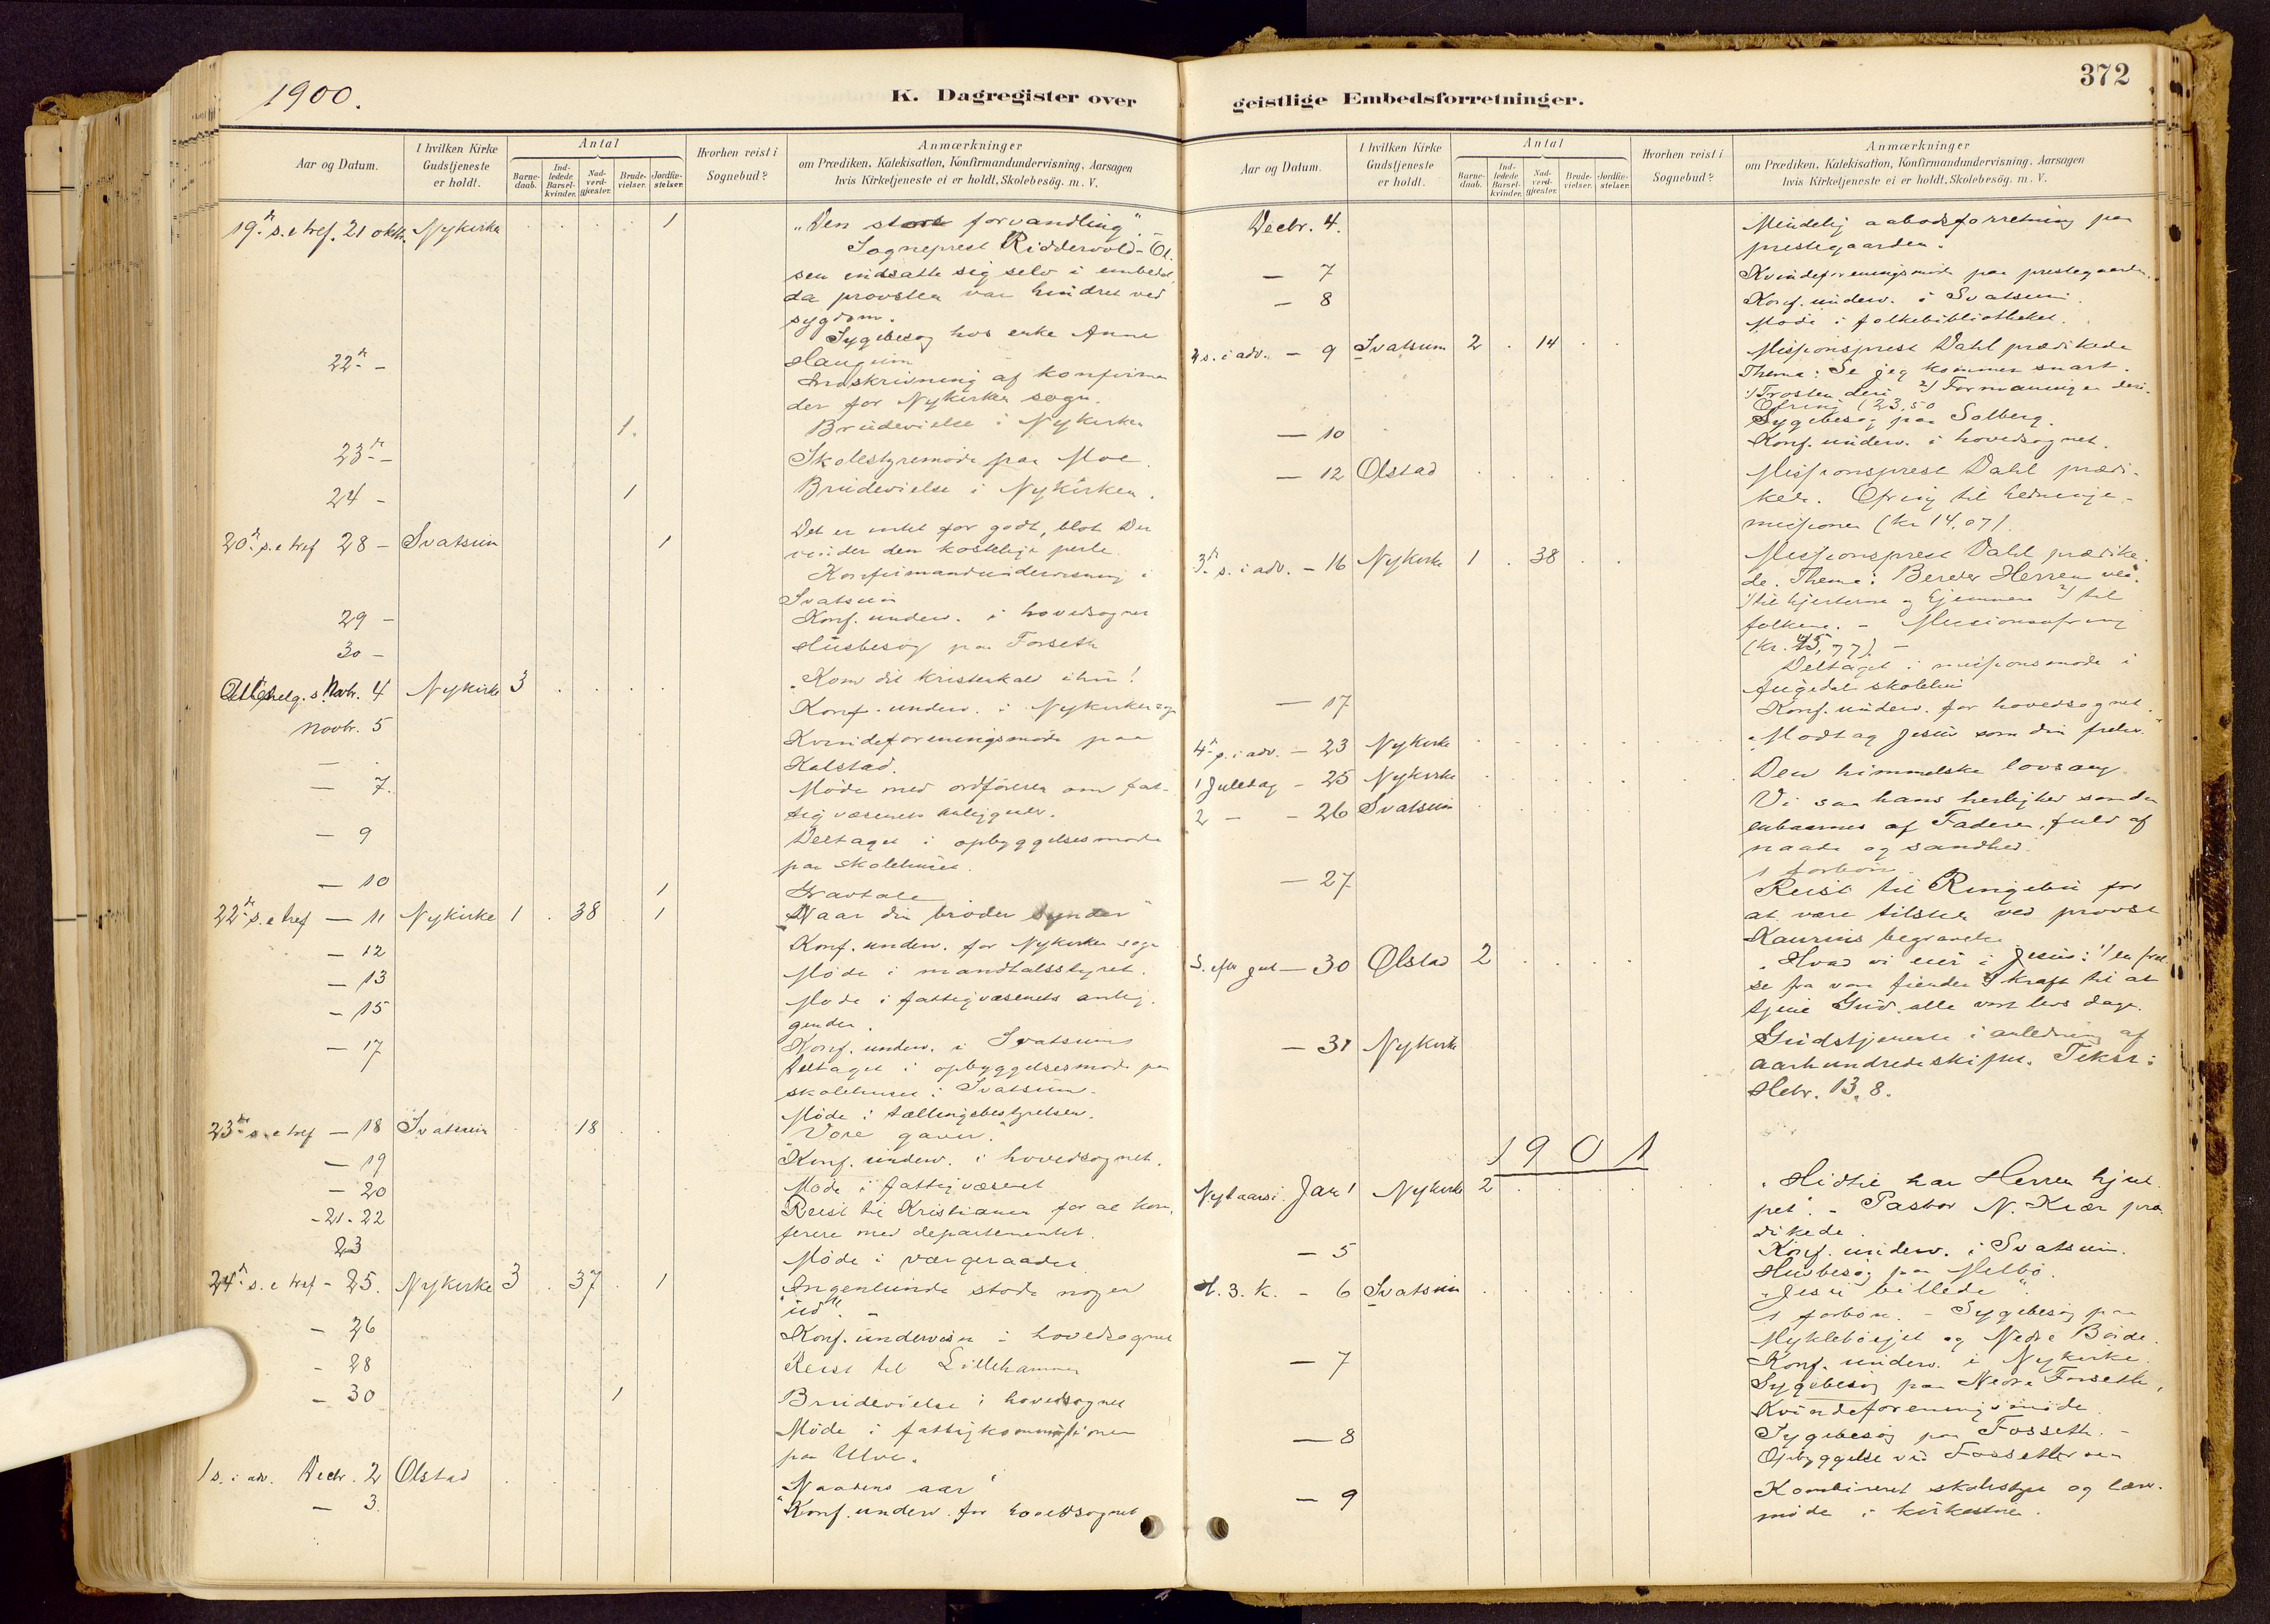 SAH, Vestre Gausdal prestekontor, Ministerialbok nr. 1, 1887-1914, s. 372